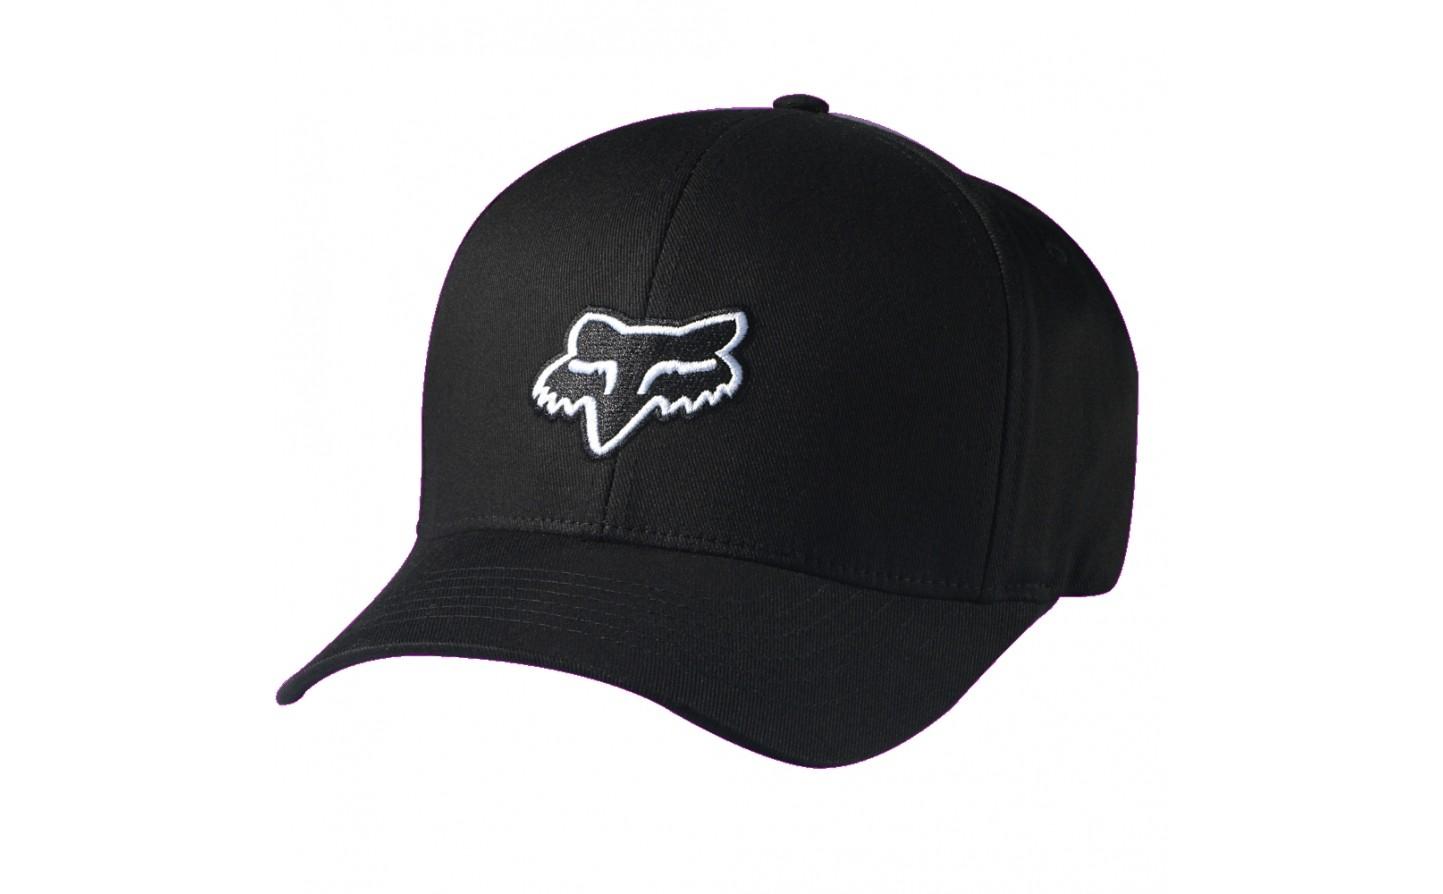 fe07738f0788a Gorra fox legacy flexfit negro fabregues motos jpg 1443x894 Gorras fox